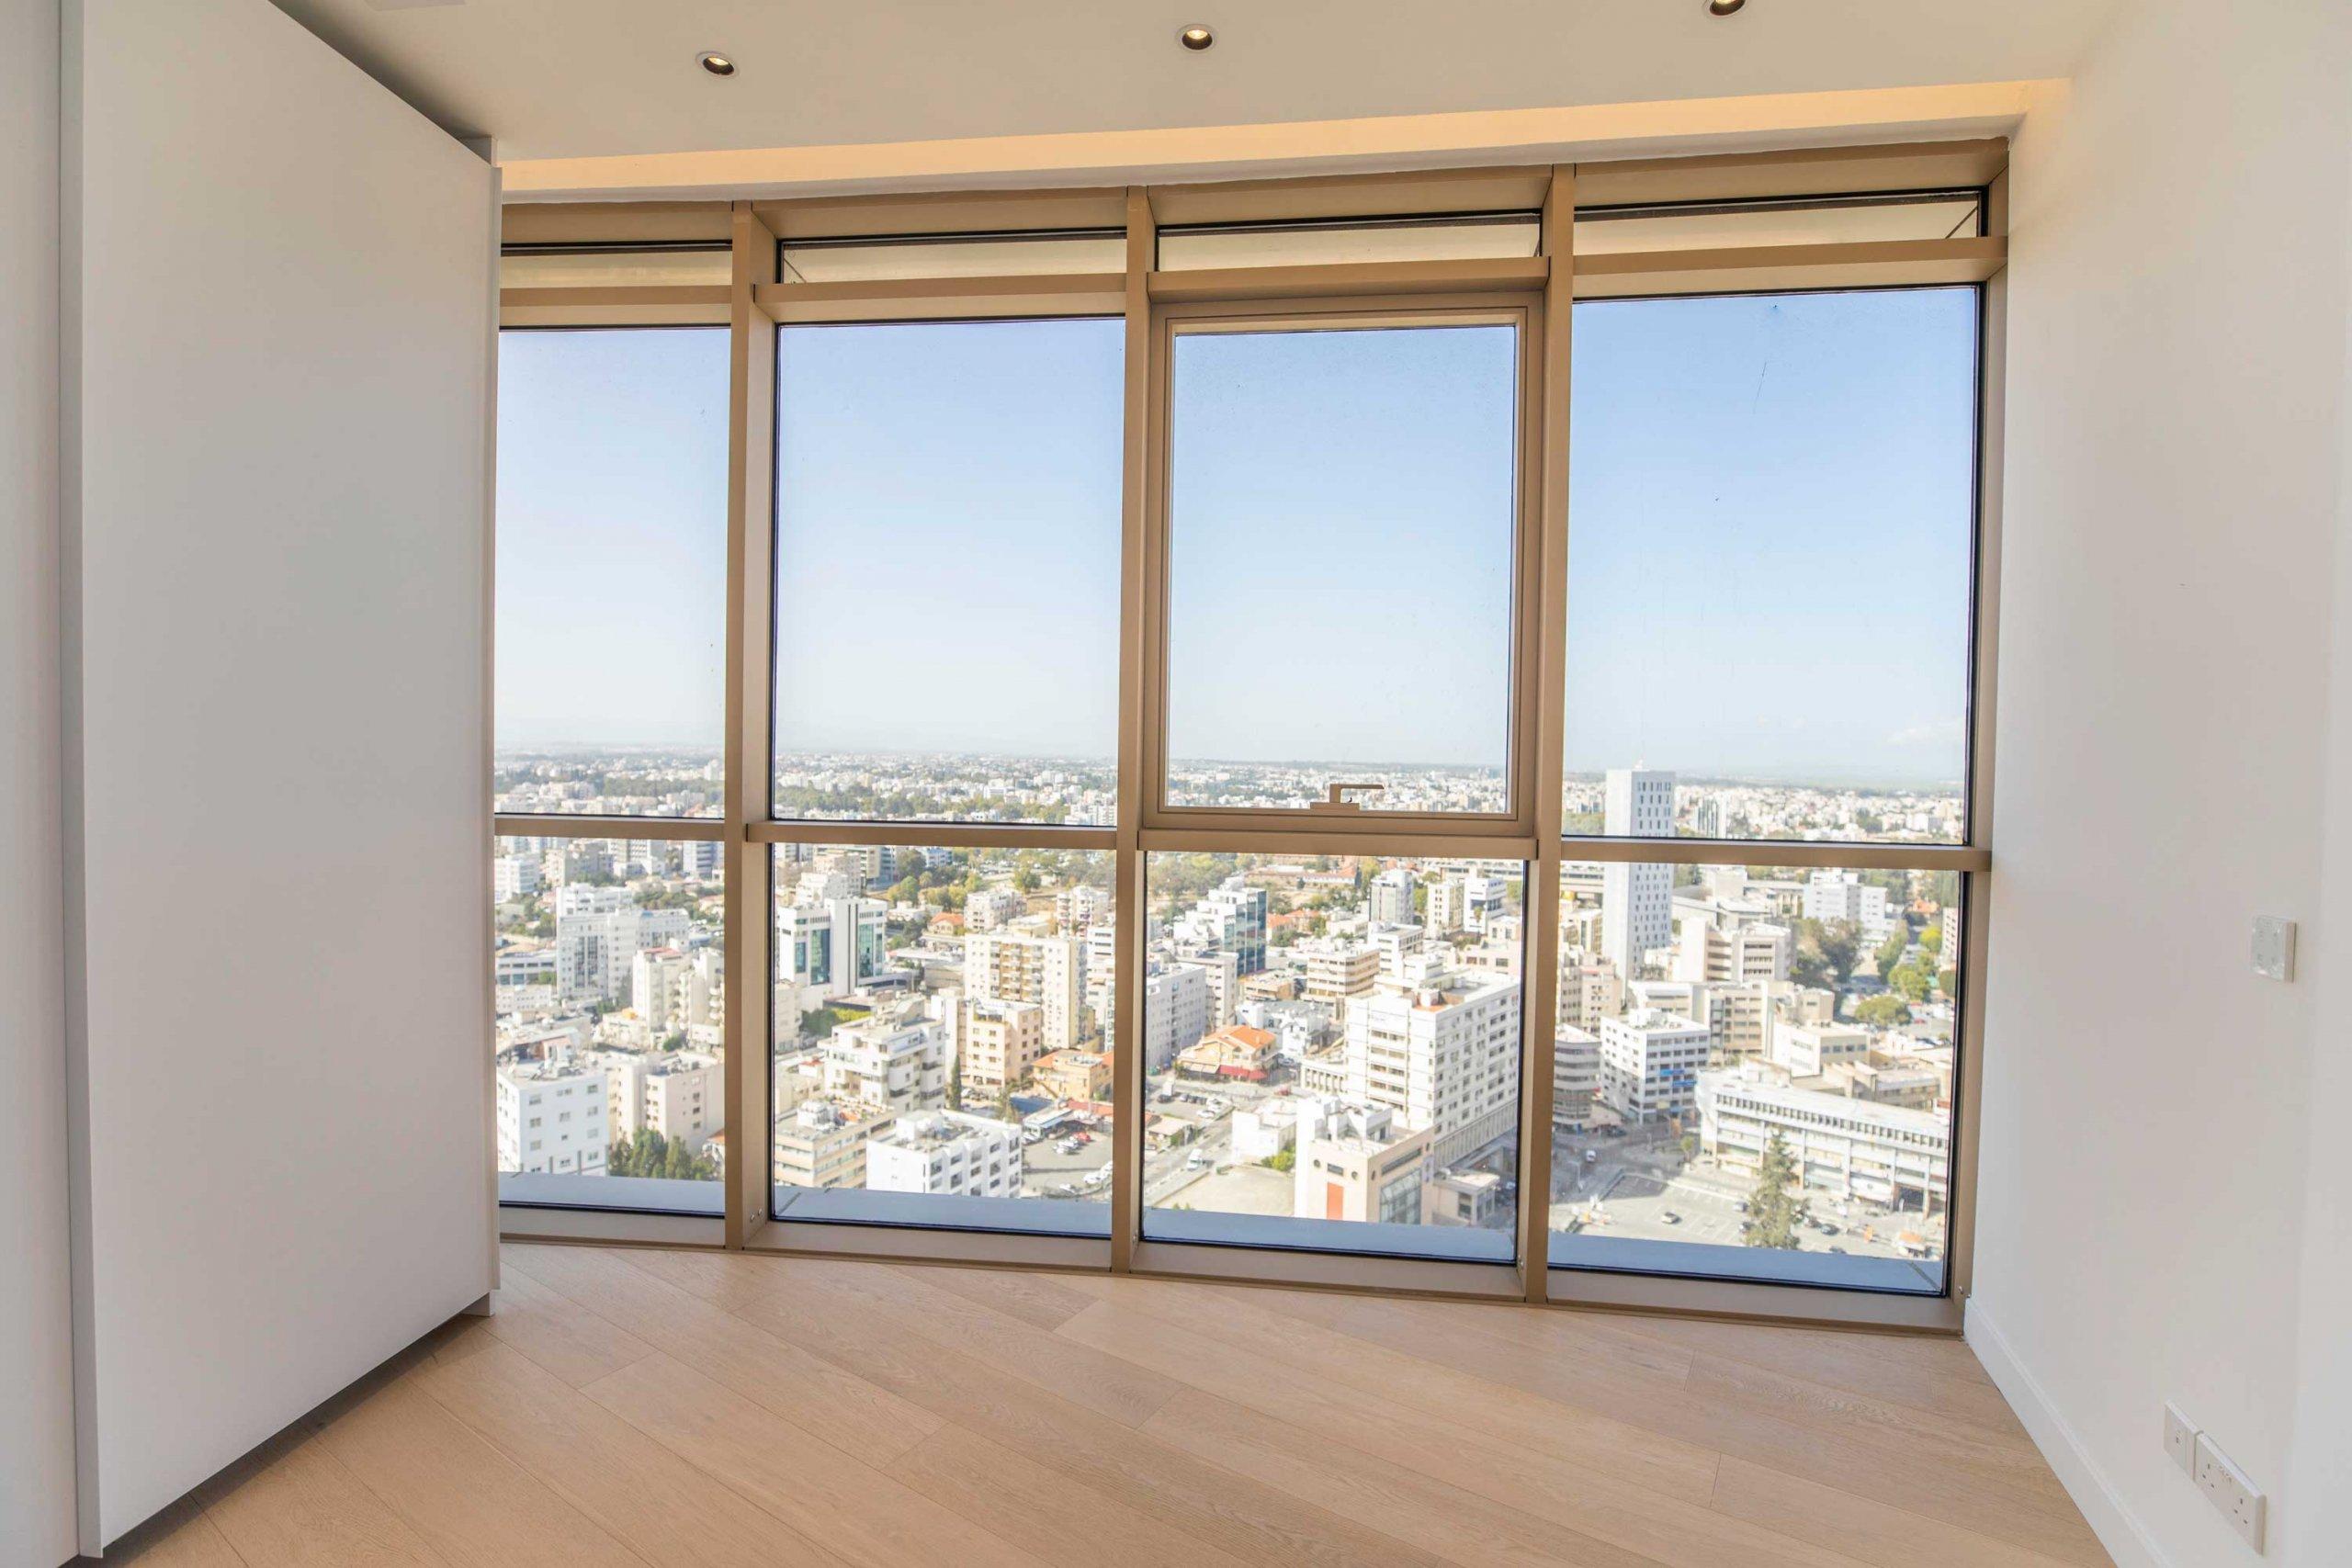 360 Nicosia – Apartment 2301